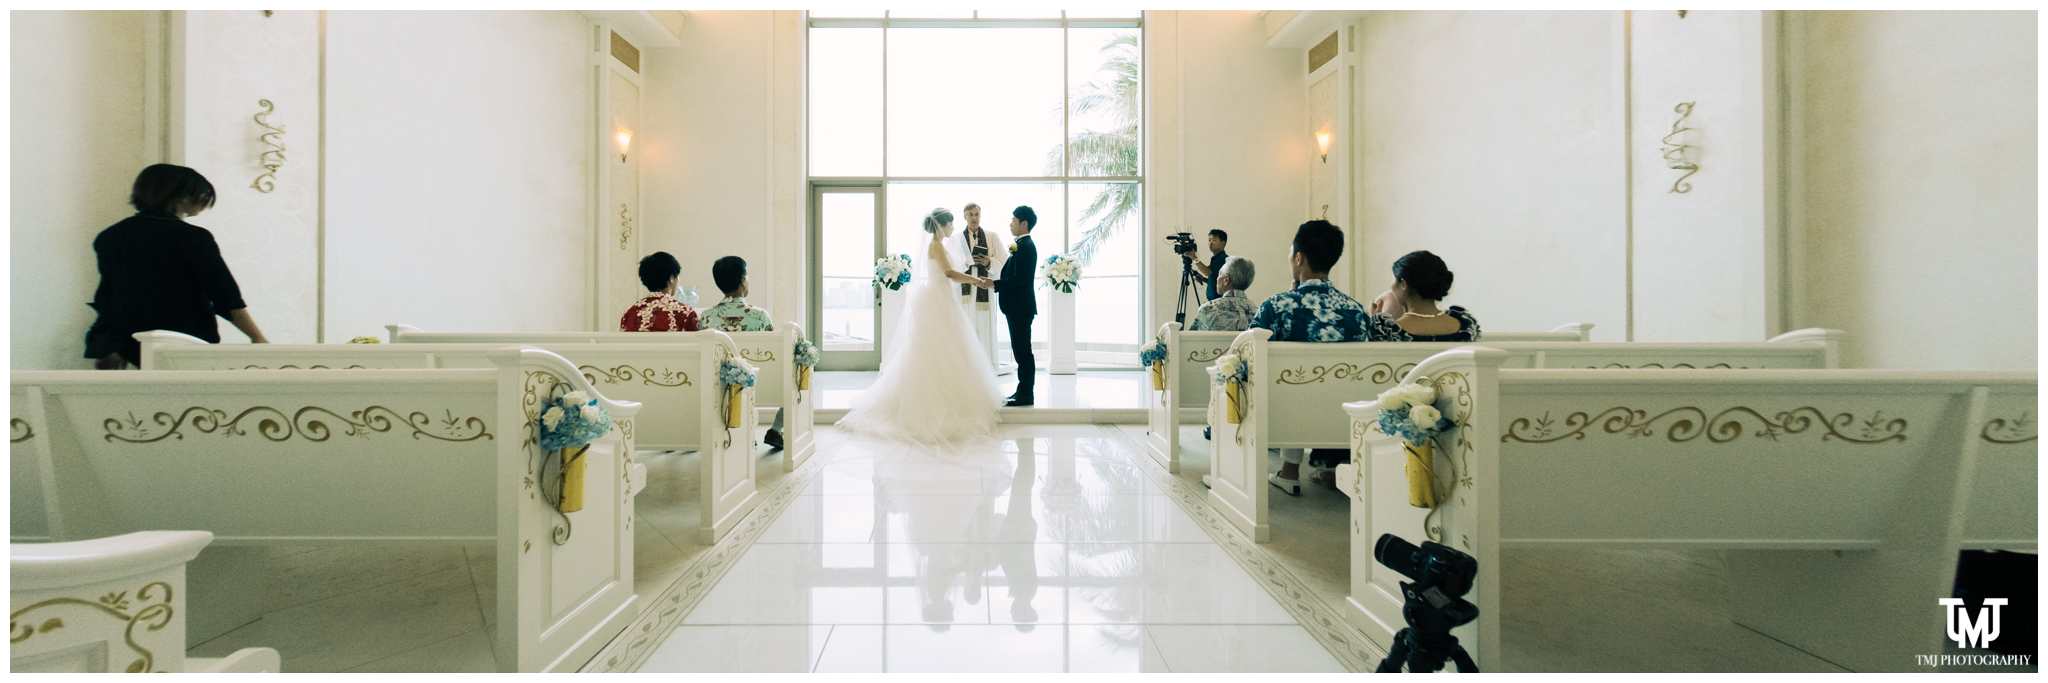 Moana Surfrider Terrace By The Sea Honolulu Destination Wedding 037.jpg